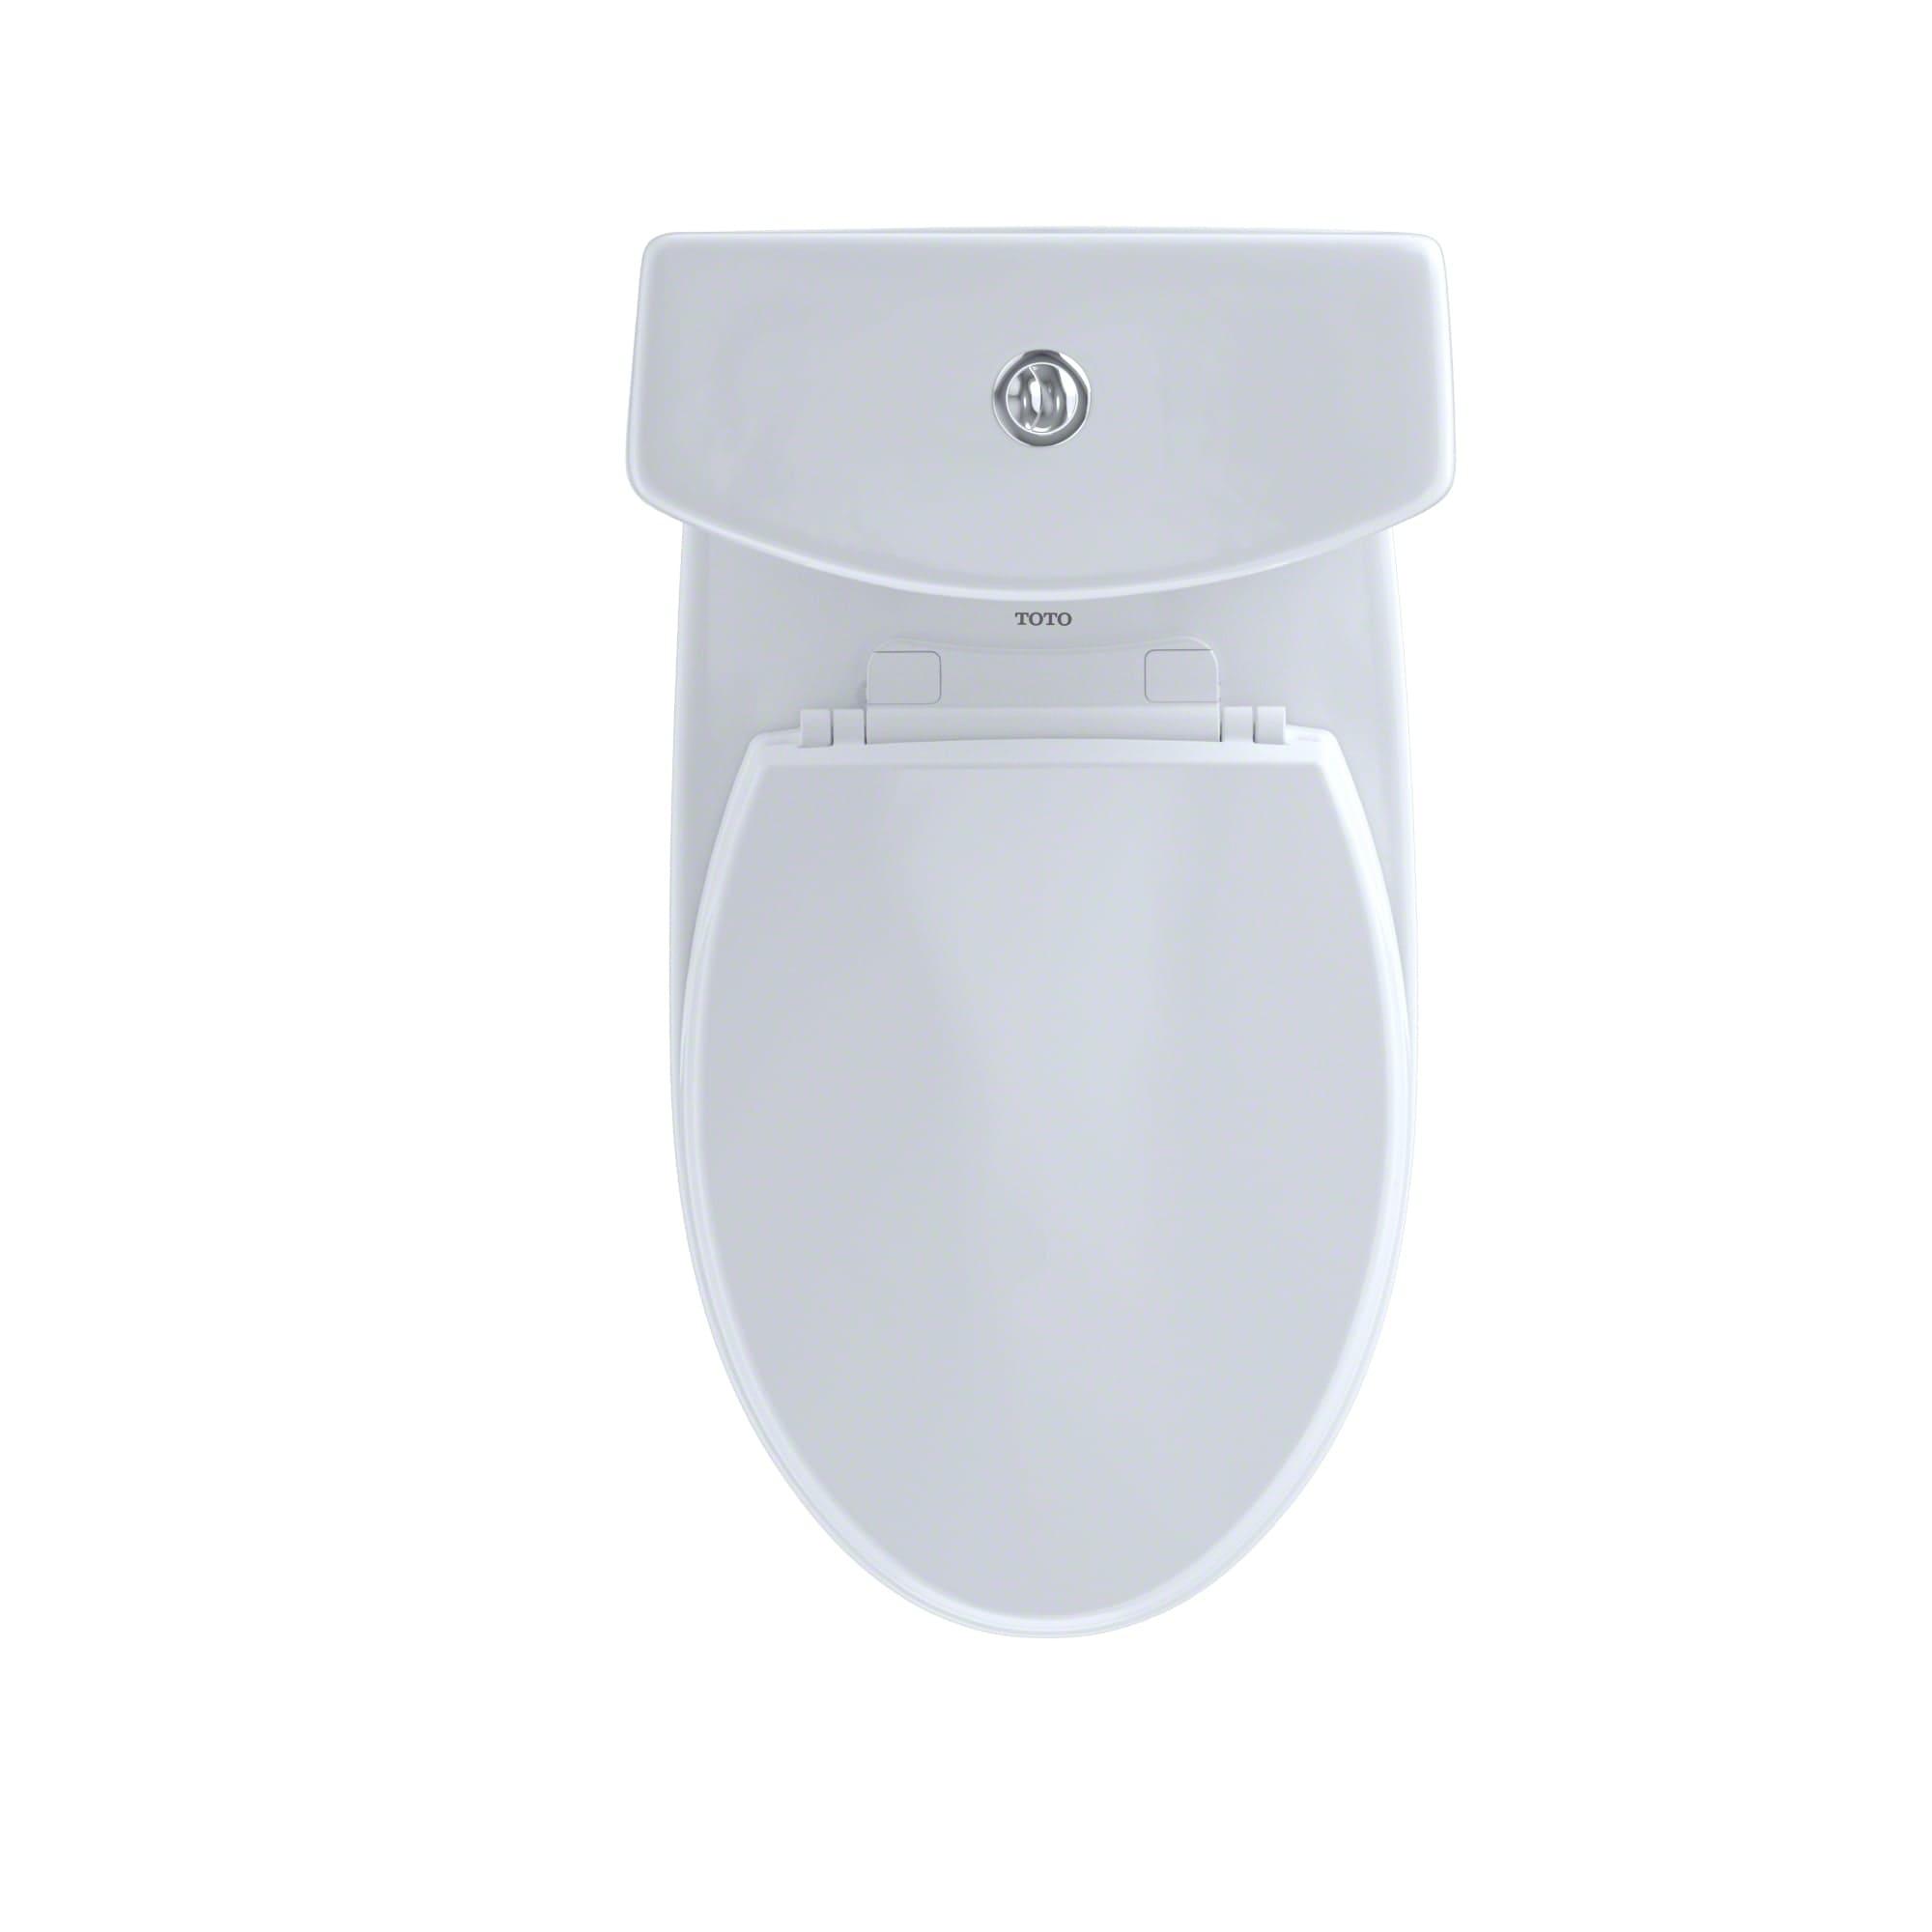 Toto Toilets Handicap Height | Sevenstonesinc.com